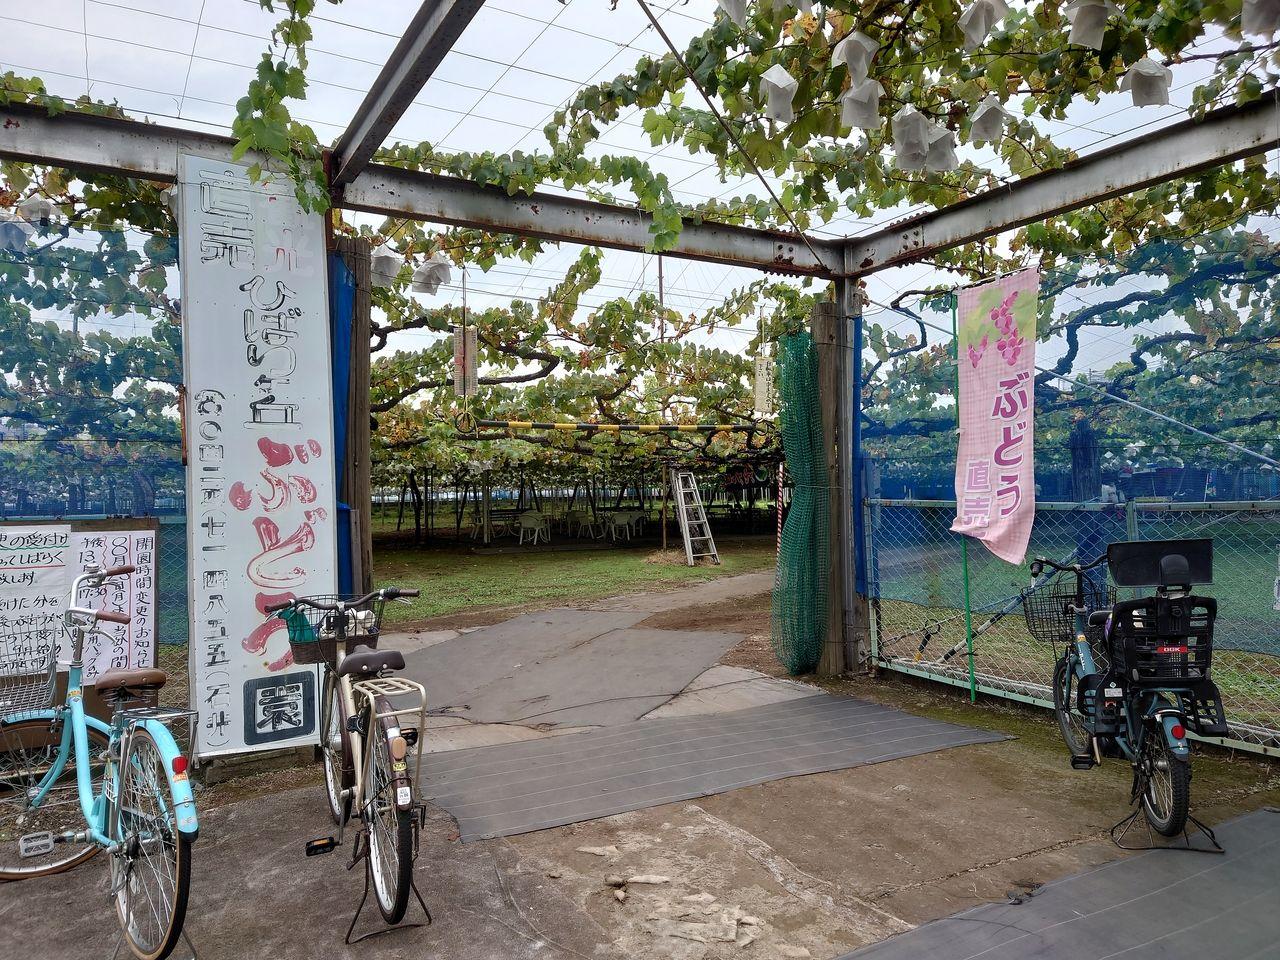 自転車置場と駐車場有